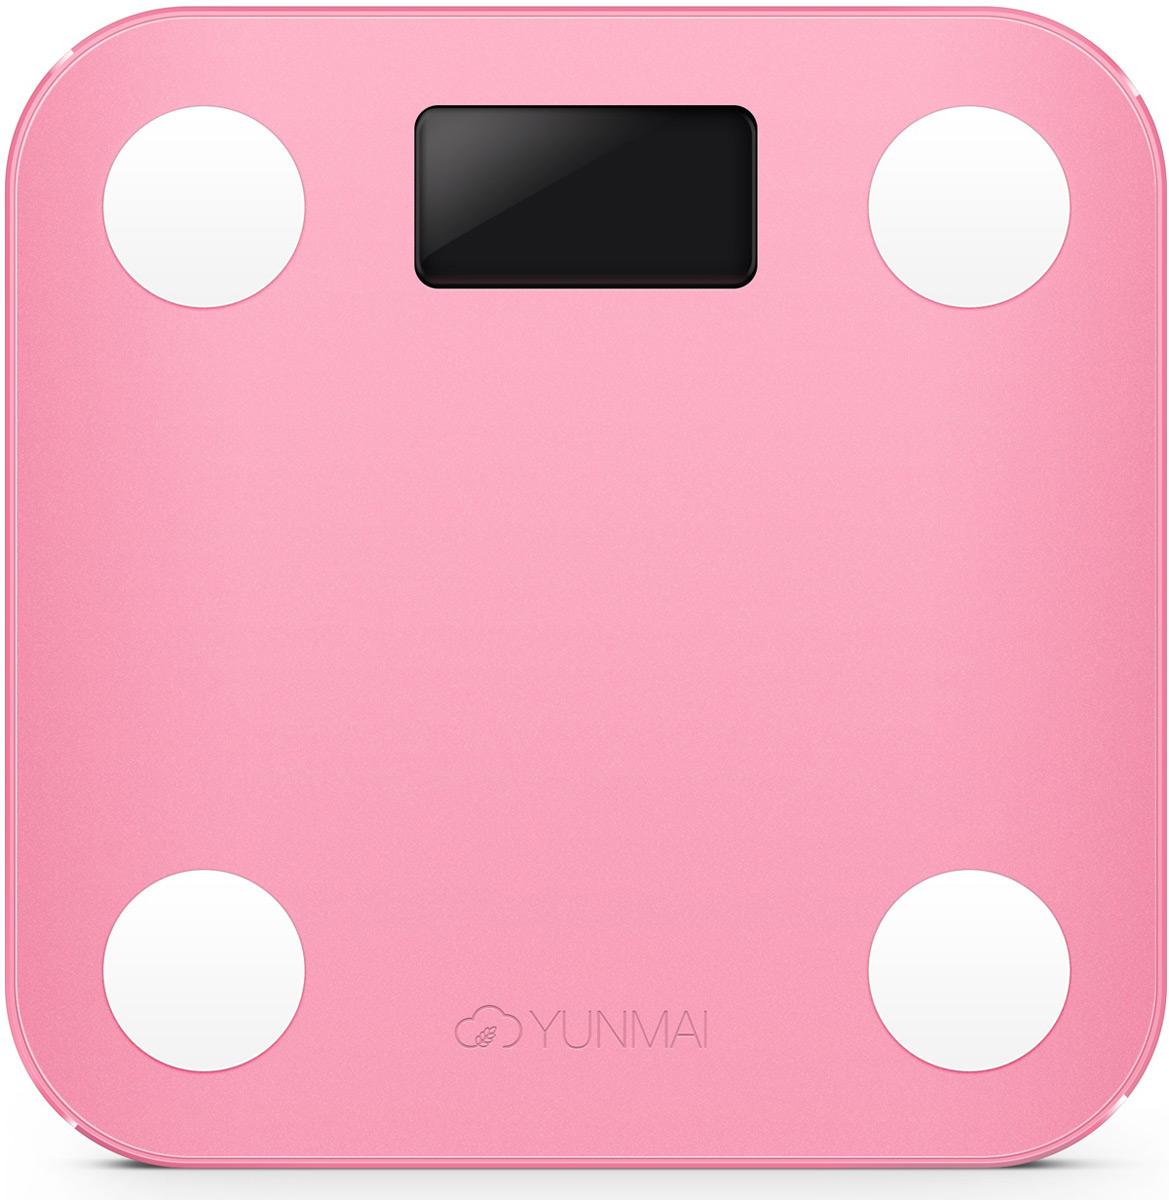 Yunmai Mini, Pink весы напольные - Напольные весы